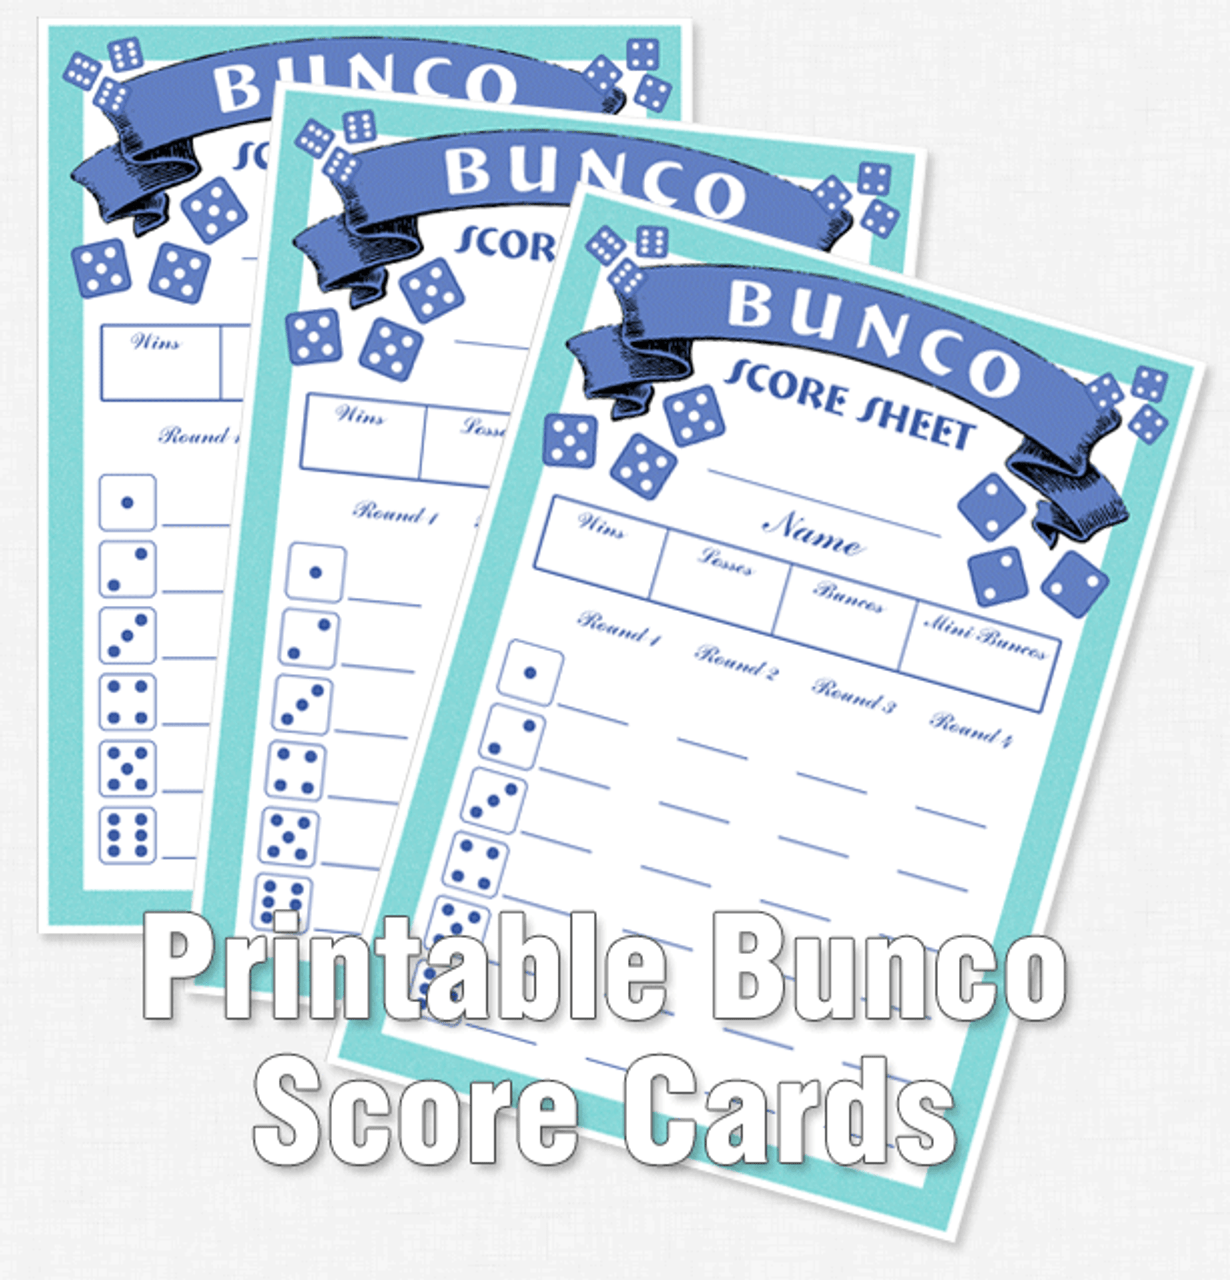 image regarding Bunco Score Sheets Free Printable referred to as Printable Bunco Ranking Playing cards